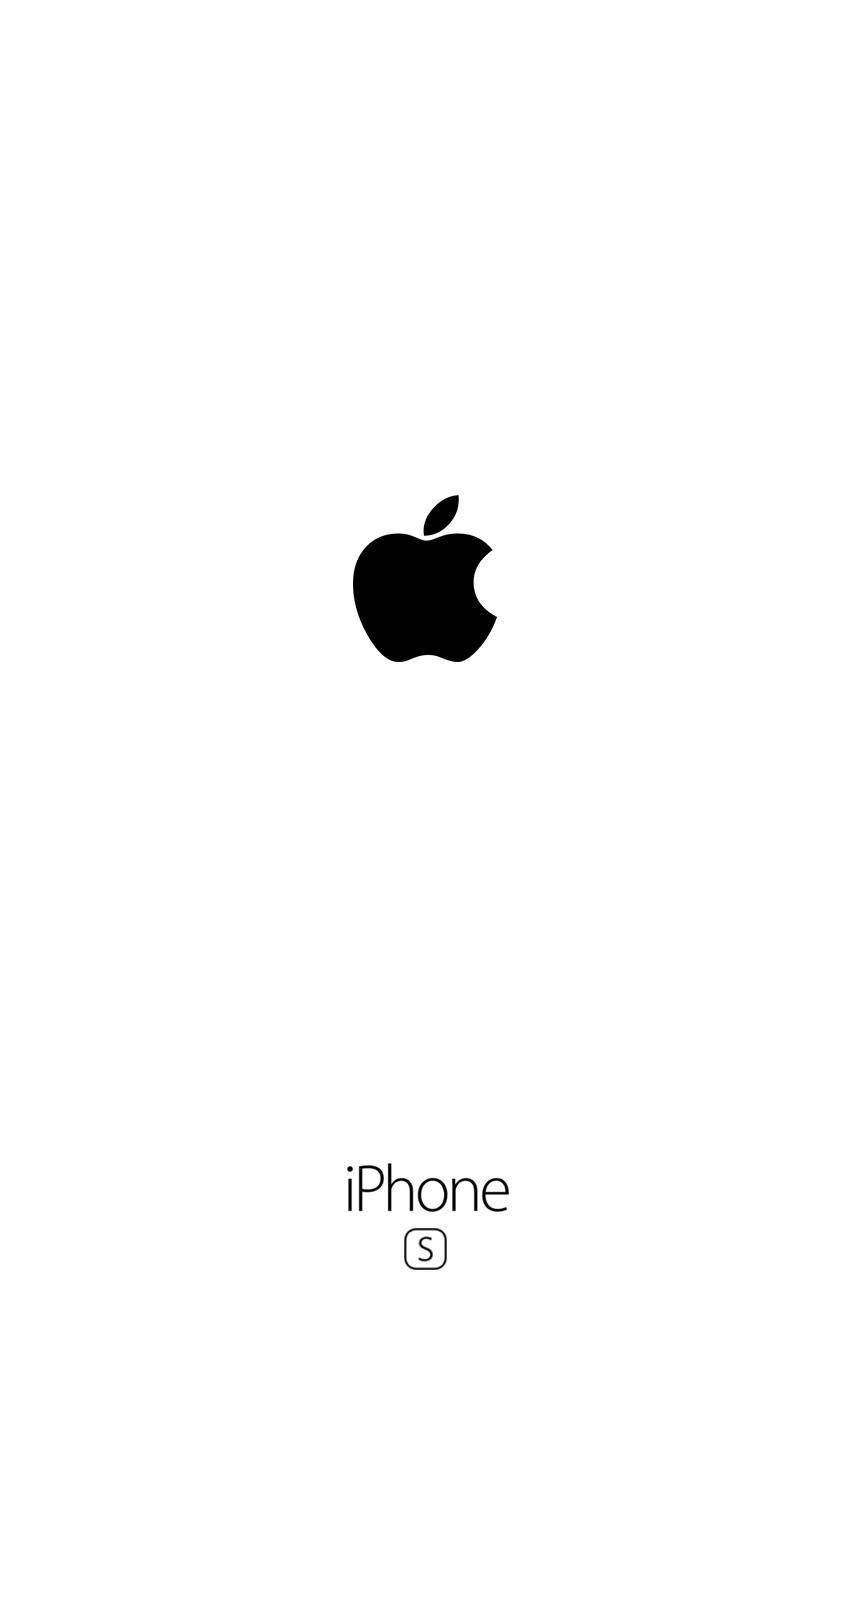 Iphone 6s Wallpaper White Logo Apple Fond Decran Blanc